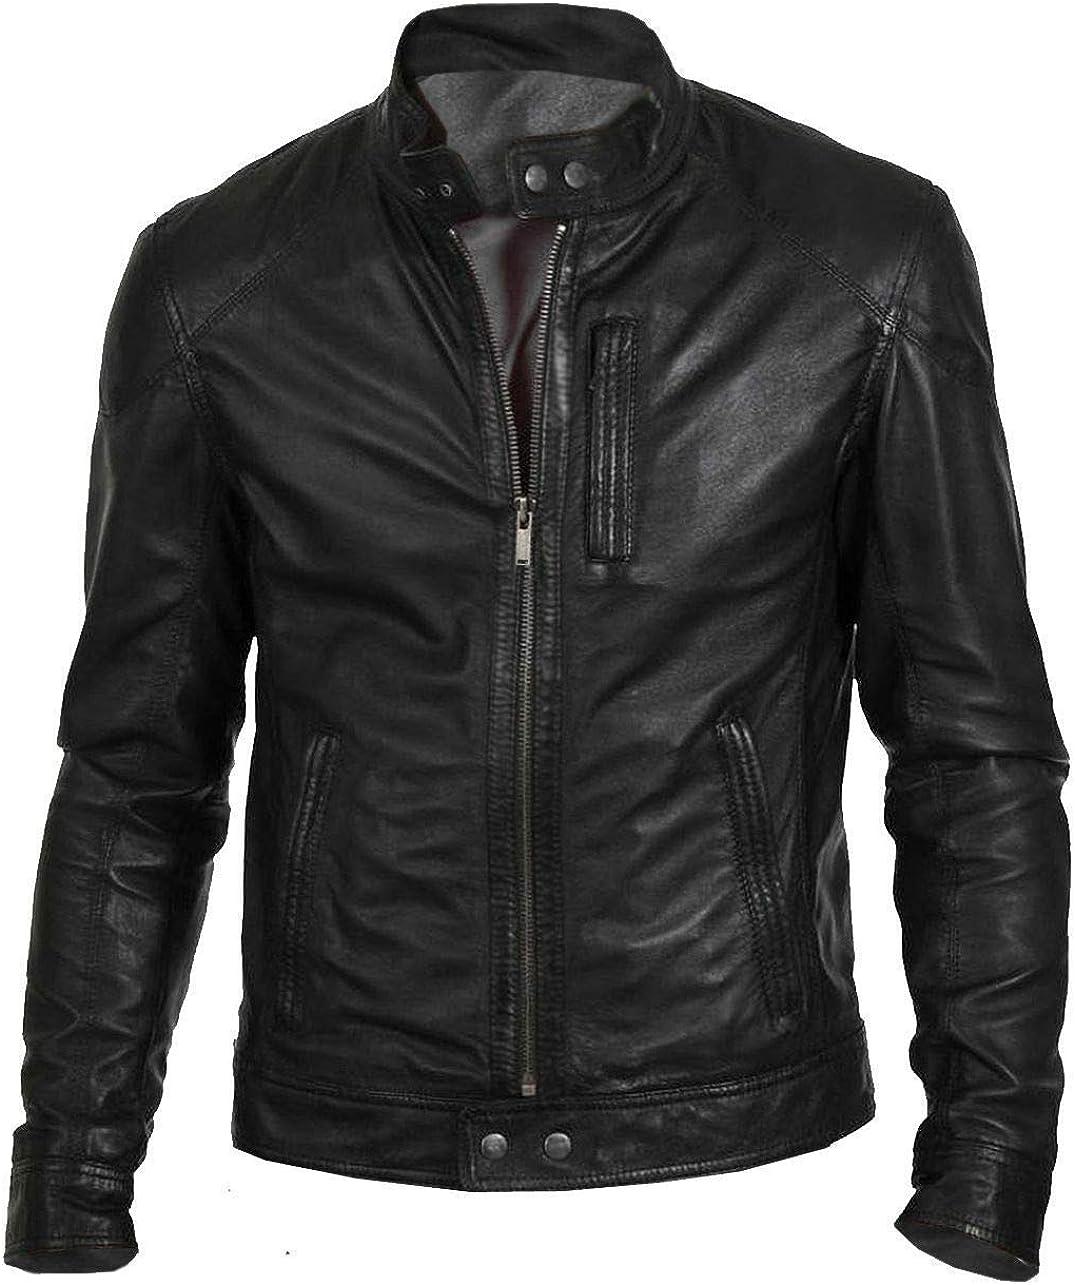 Zamish Leather Mens Hunt Black Classic Fashion Biker Jacket in Lambskin Leather